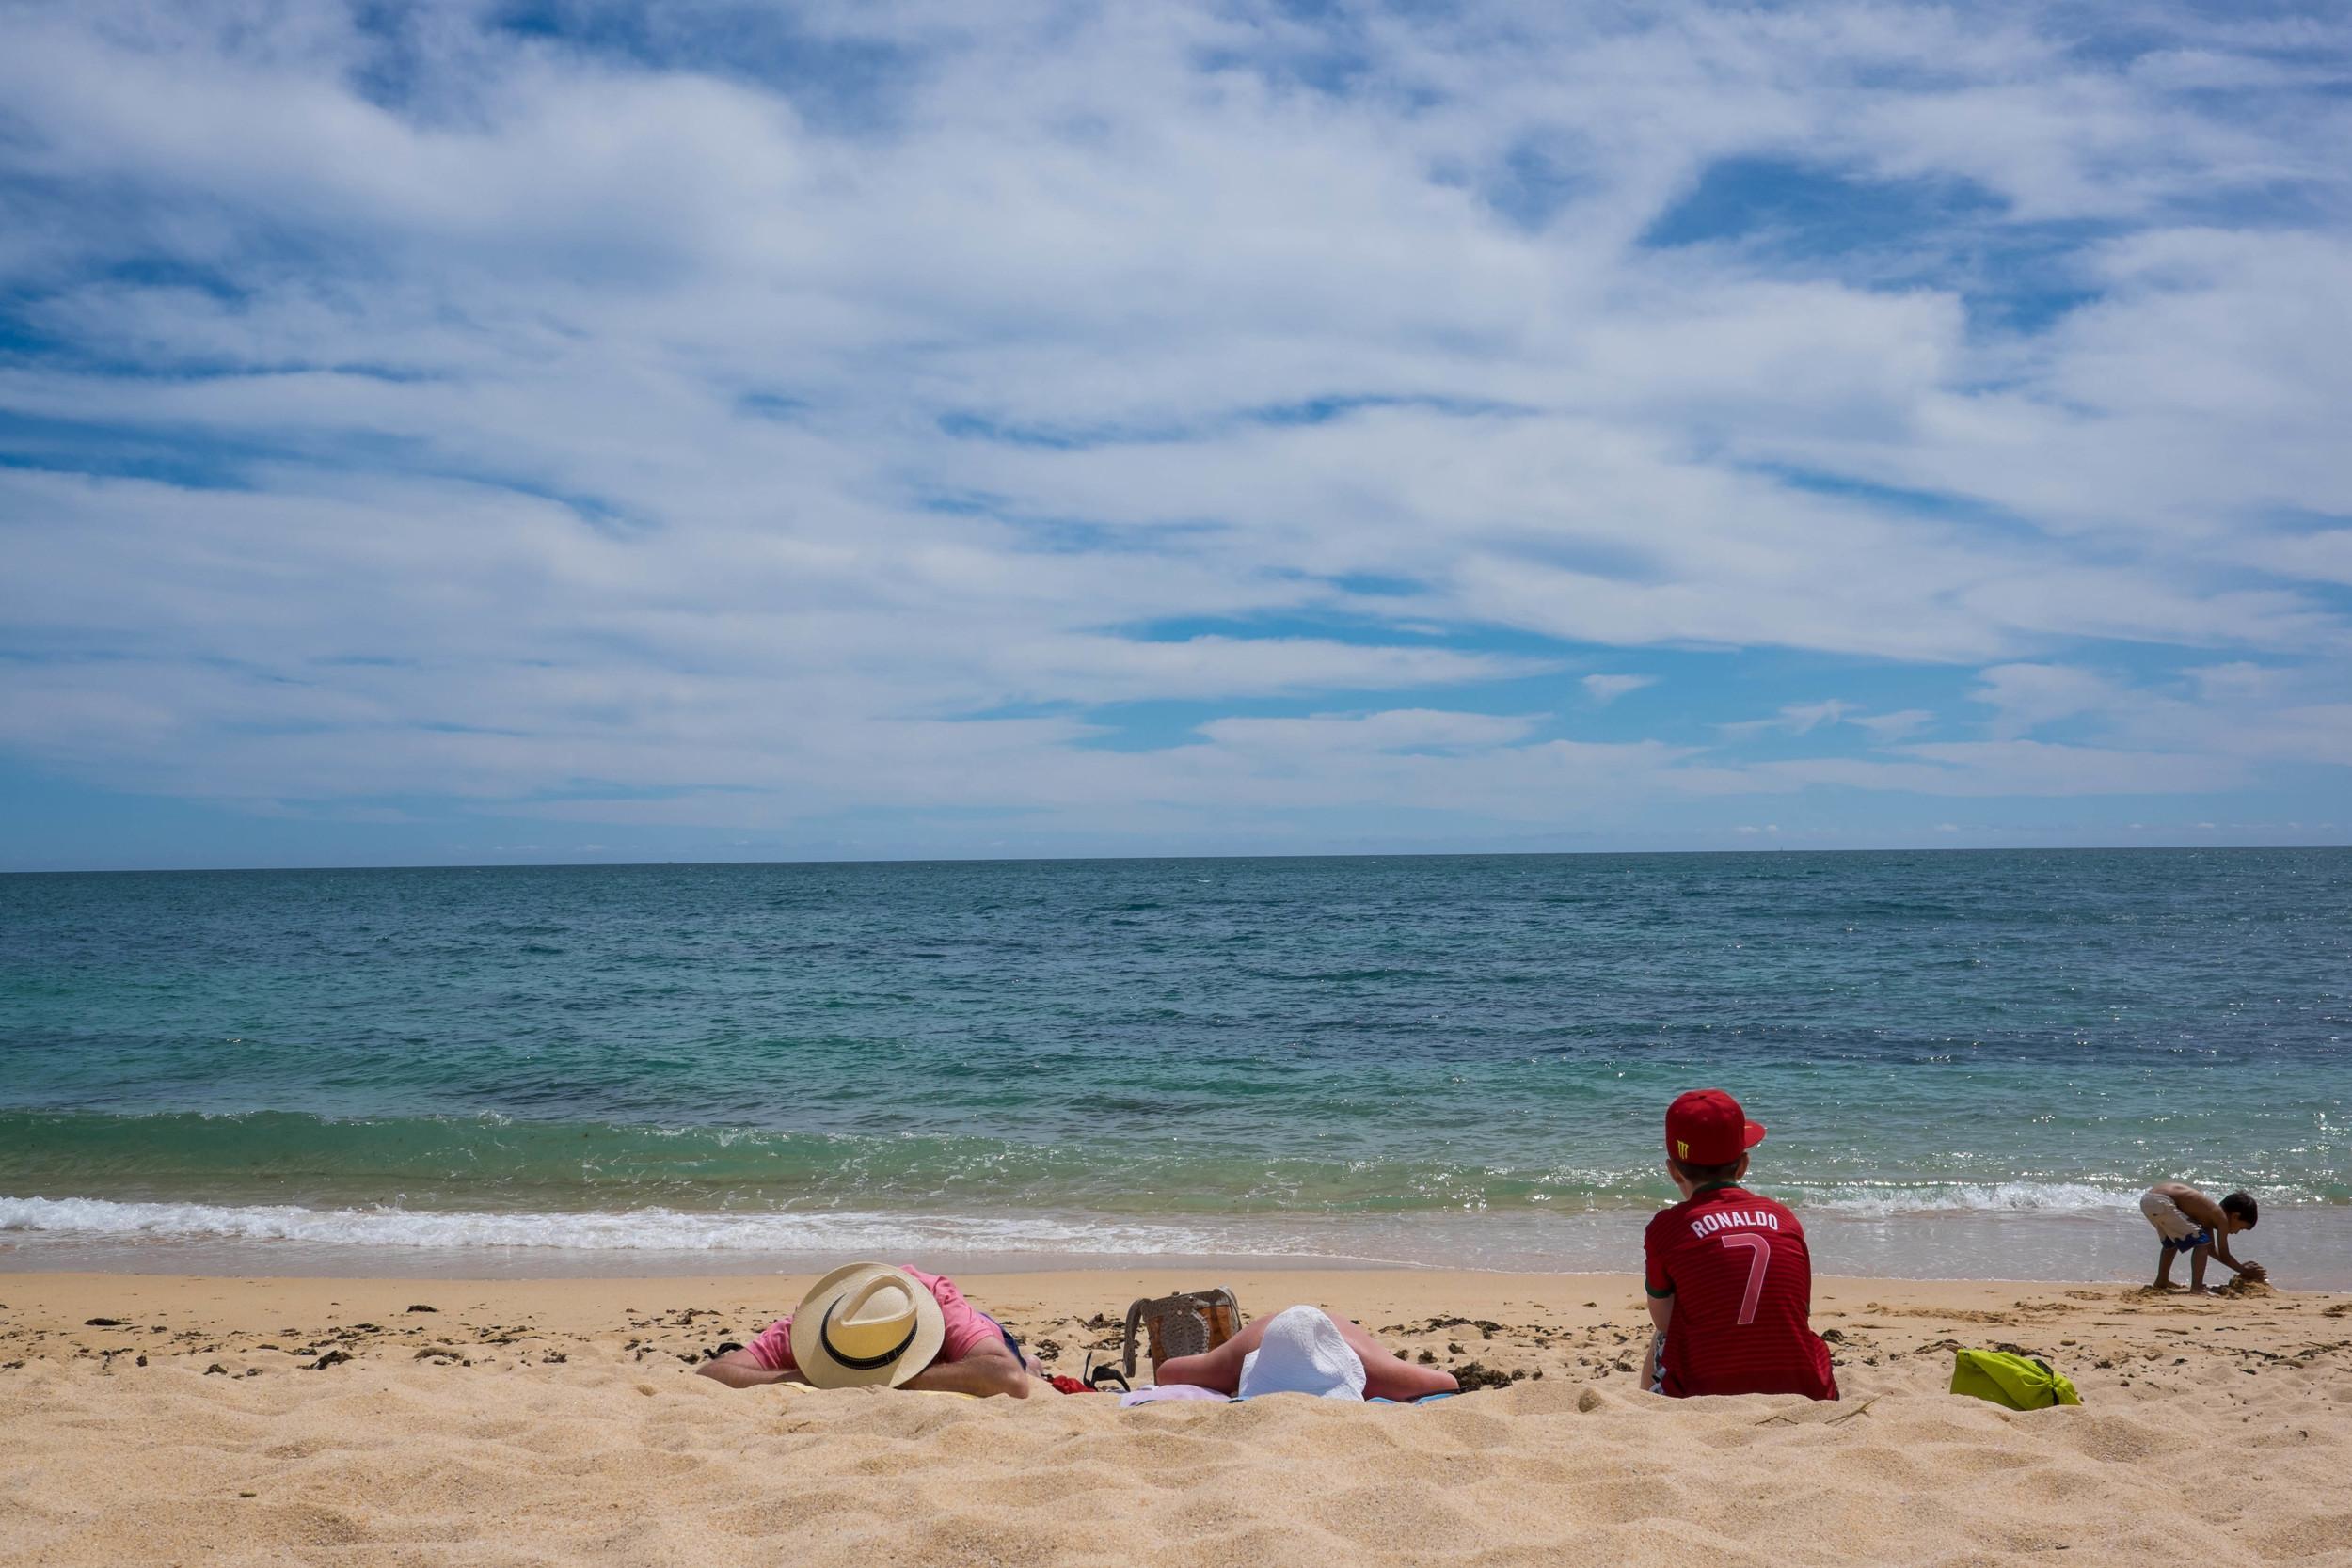 Kristen_Humbert_Philadelpia_Photographer_Travel_Editorial_Portugal-3749.jpg